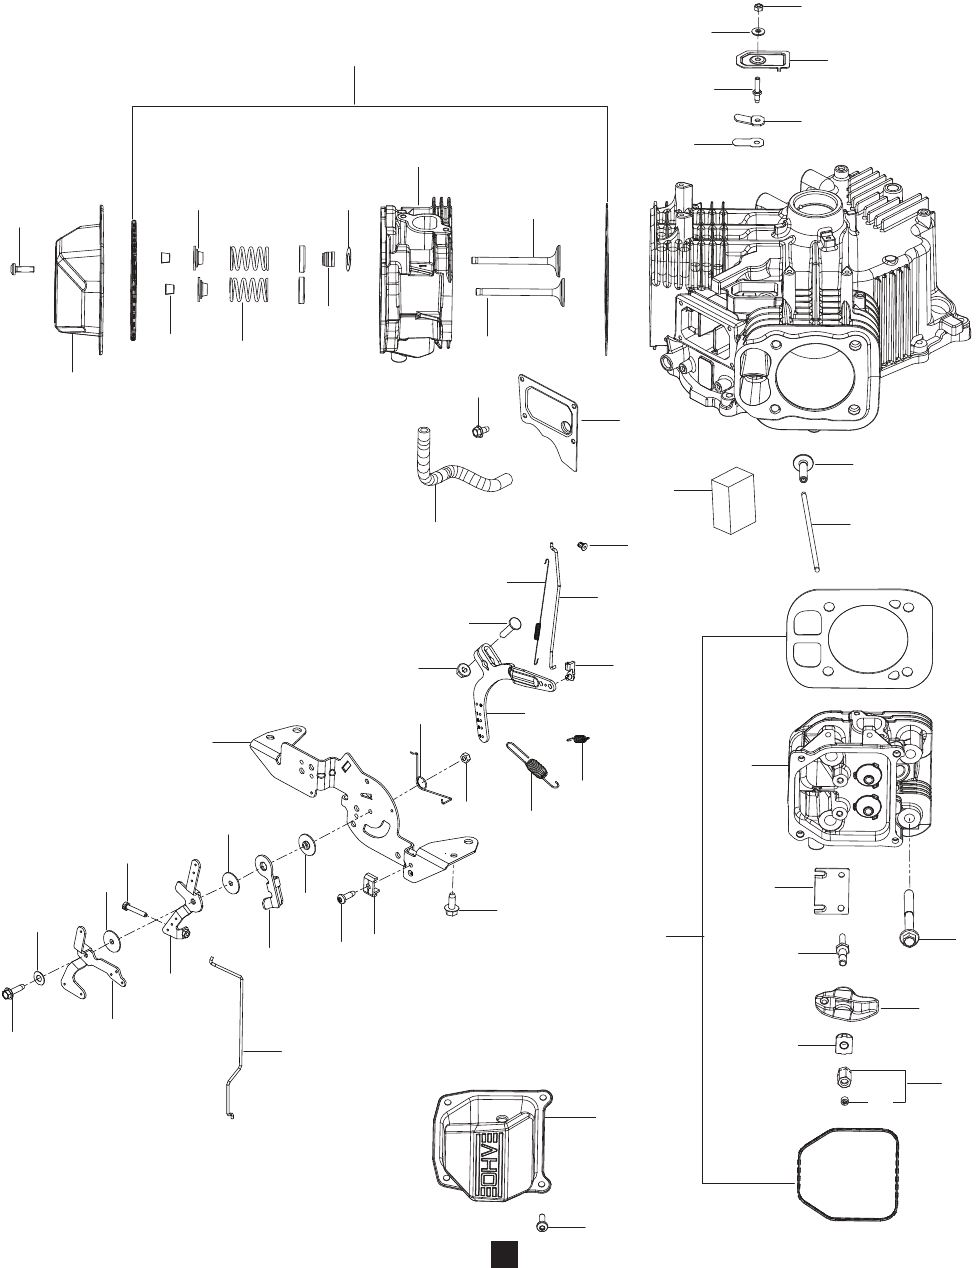 Craftsman Pro Series 54 26 Hp V Twin Z7400 Zero Turn